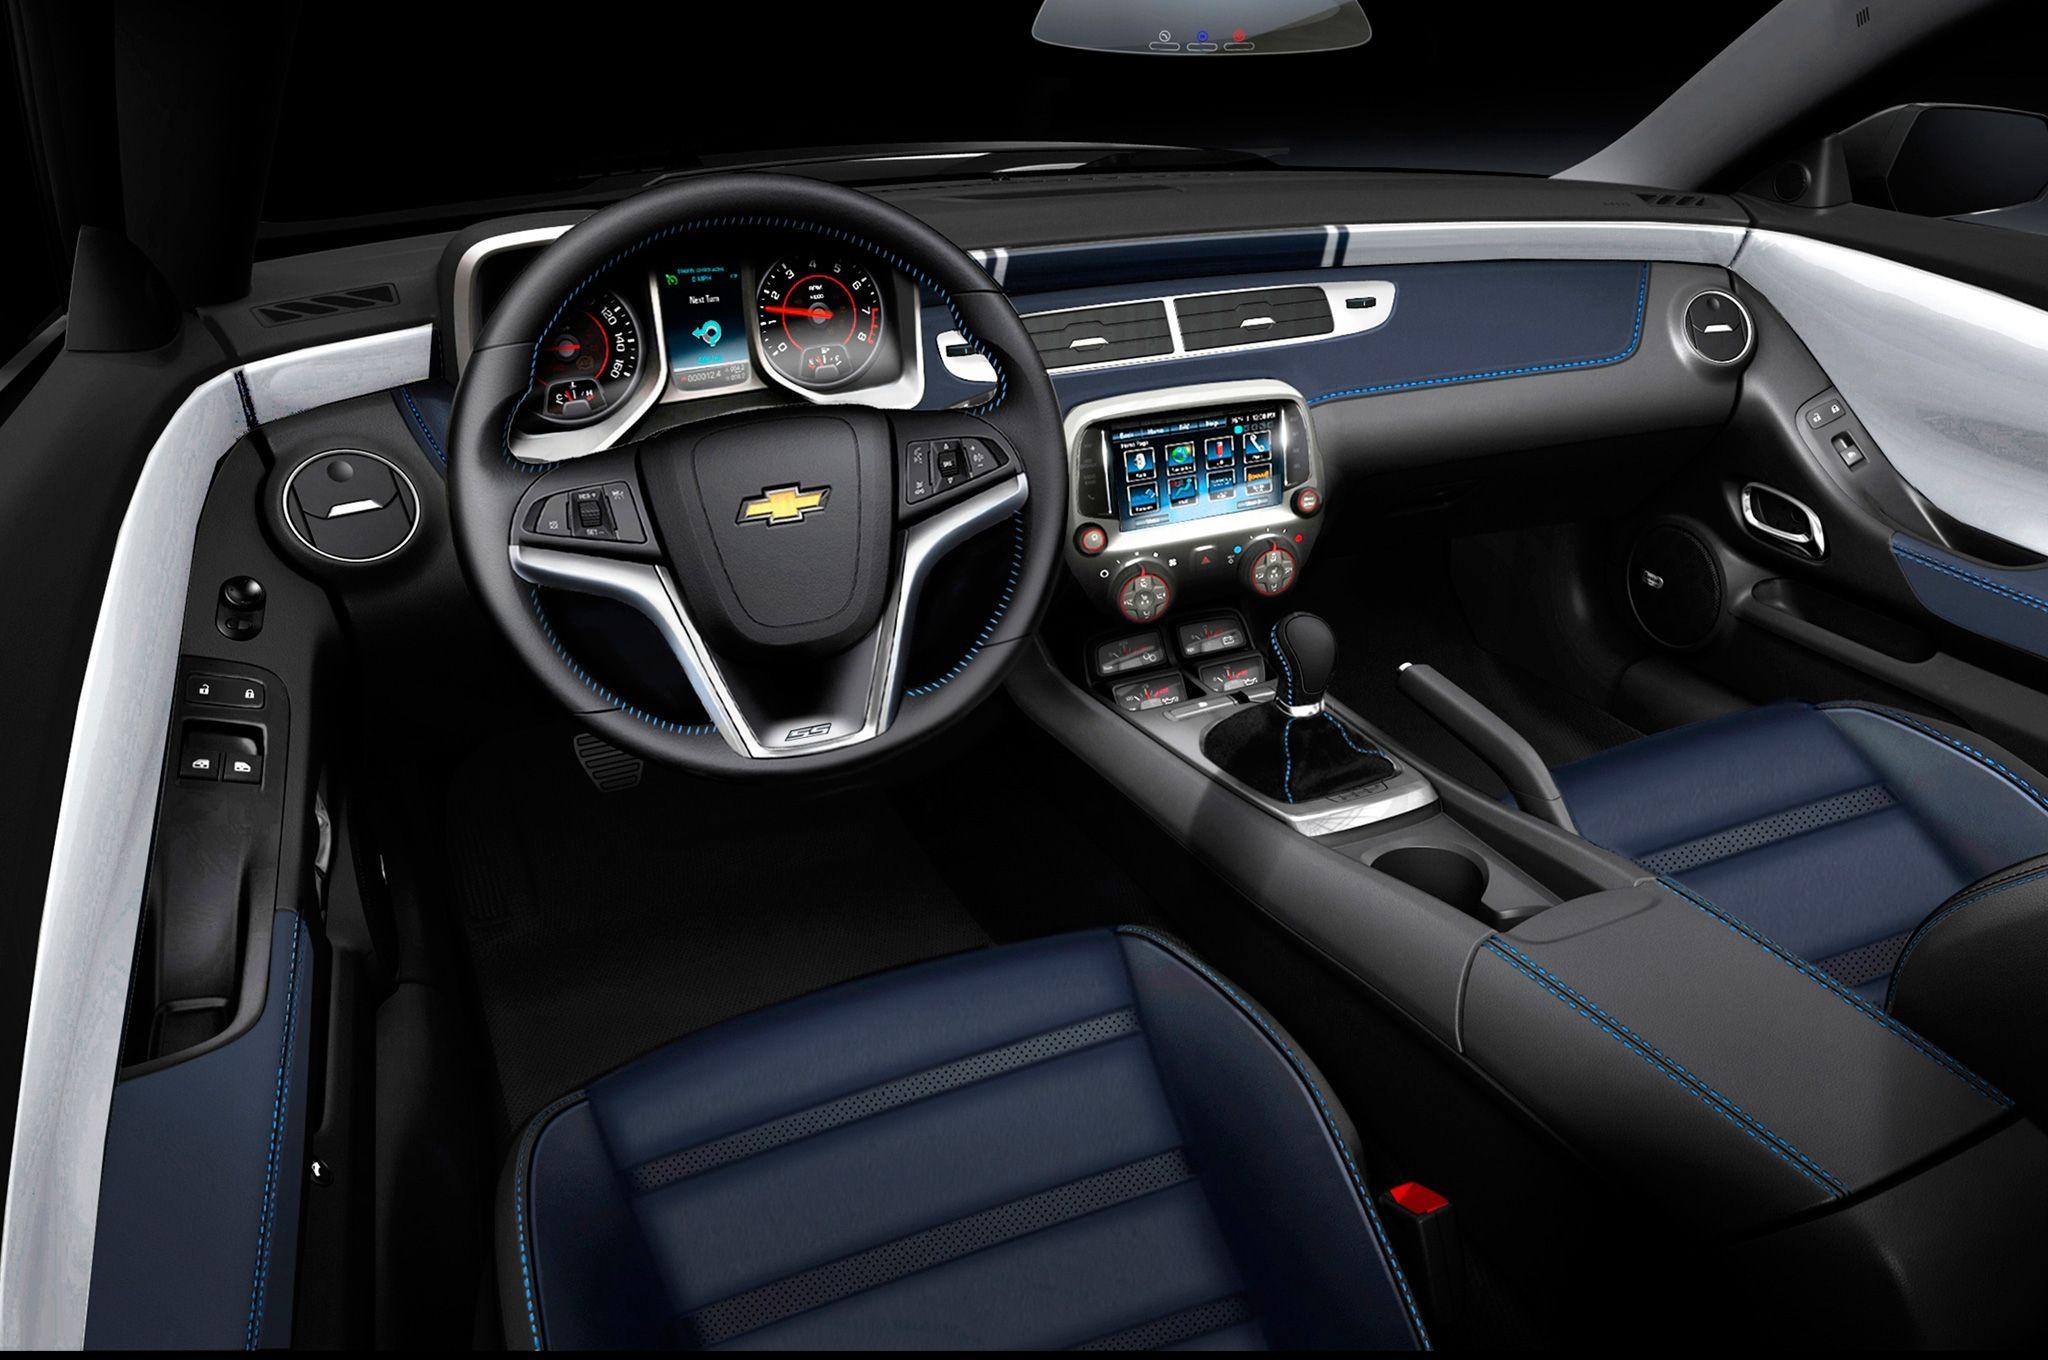 Exceptional 2014 Chevrolet Camaro Spring Special Edition 2013 Sema Concept Interior View  (2048×1360) Nice Ideas